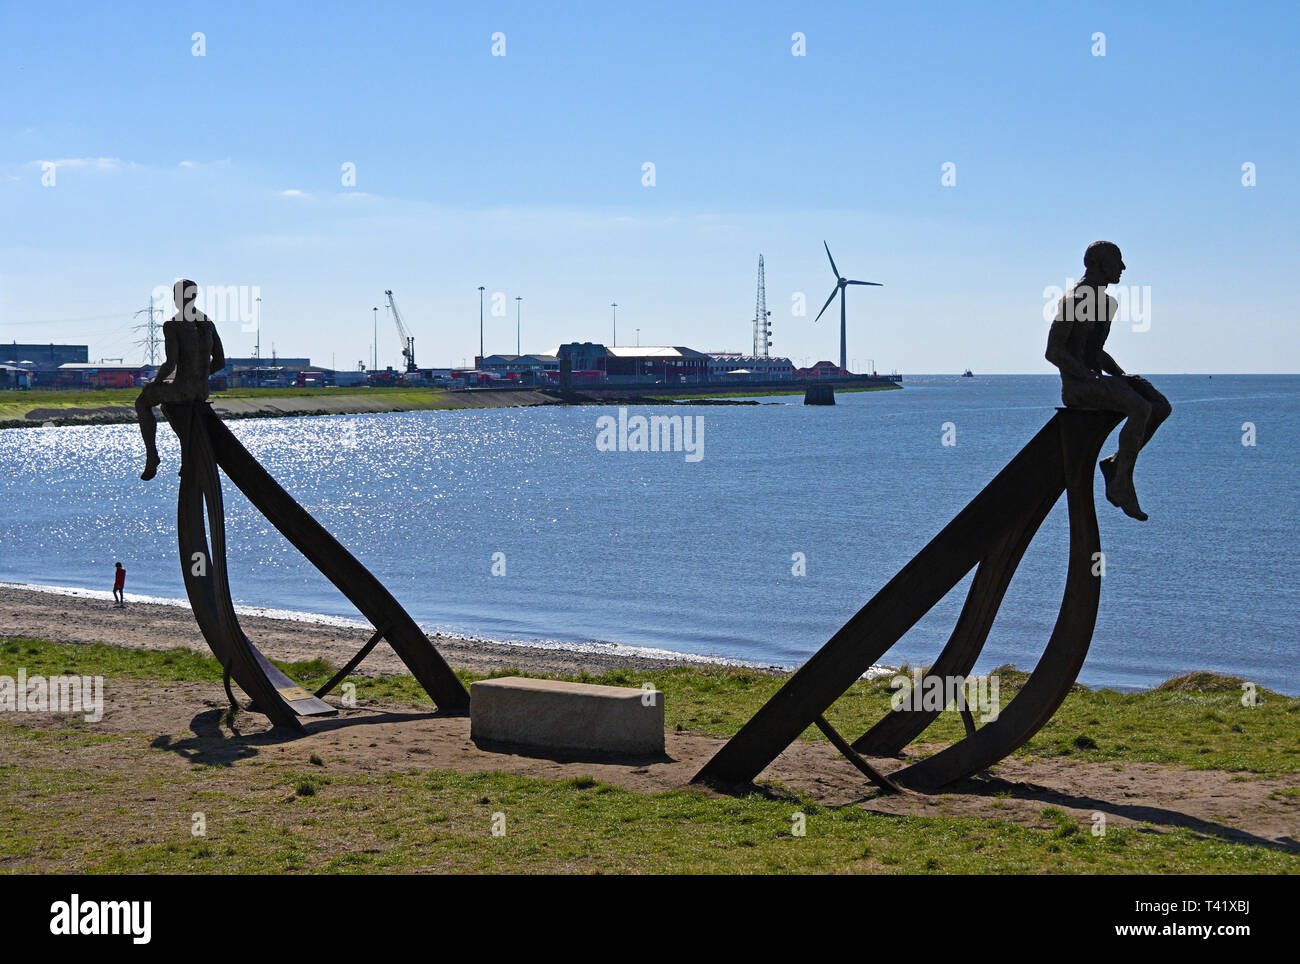 'Ship', metal sculpture by Anna Gillespie, 2019. Half Moon Bay, Heysham, Lancashire, England, United Kingdom, Europe. - Stock Image